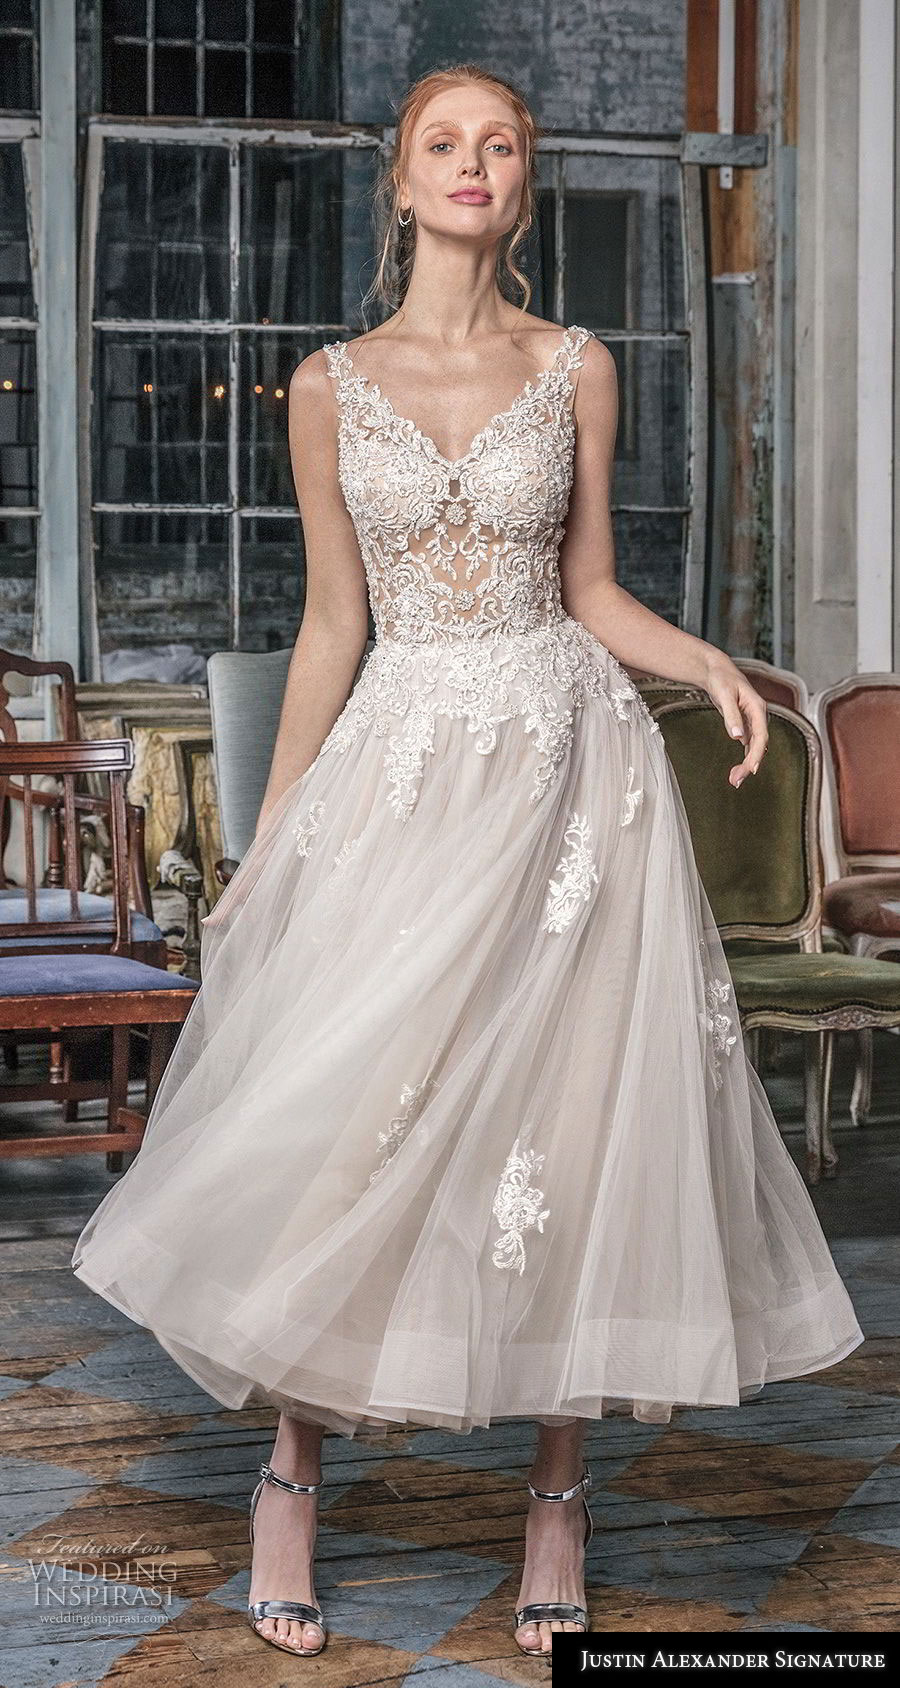 justin alexander fall 2018 signature sleeveless with strap v neck heavily embellished bodice romantic tea length short wedding dress open v back (15) mv